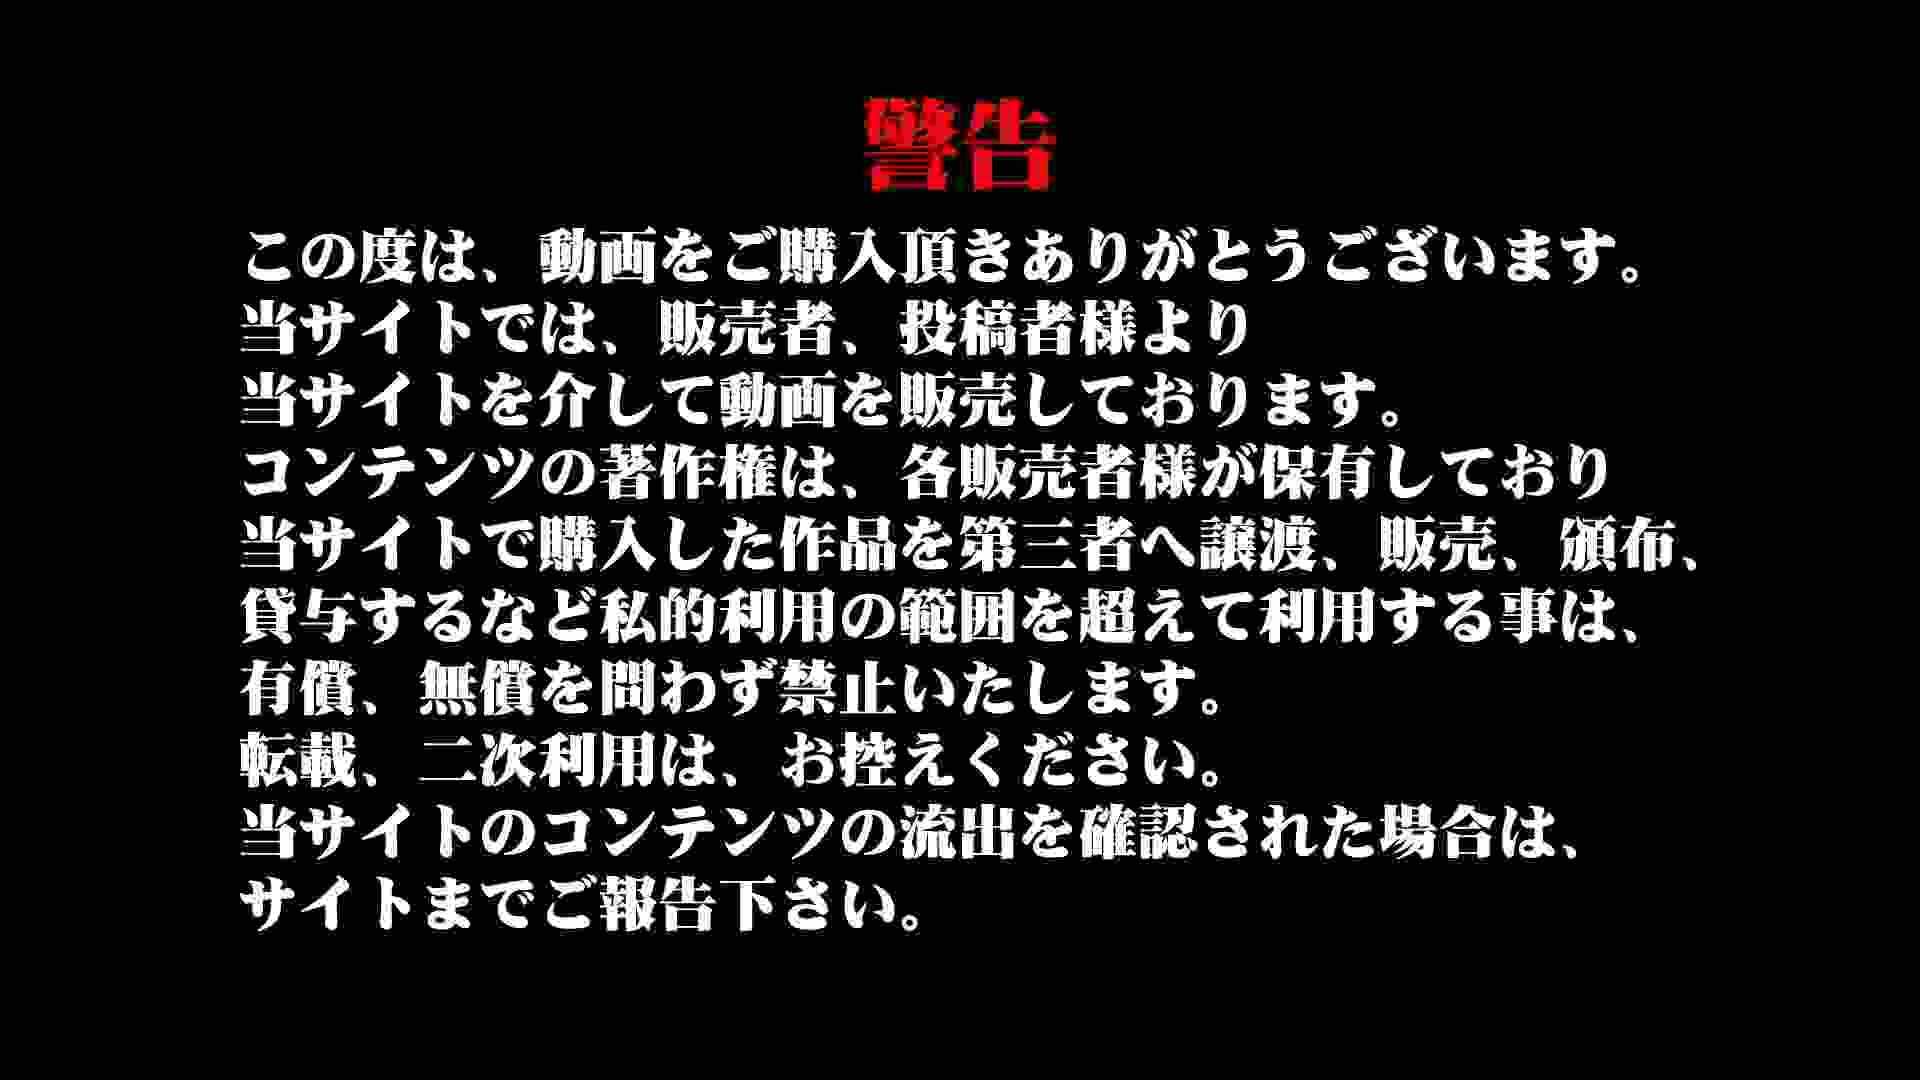 Aquaな露天風呂Vol.915 OLすけべ画像 オマンコ動画キャプチャ 99連発 26